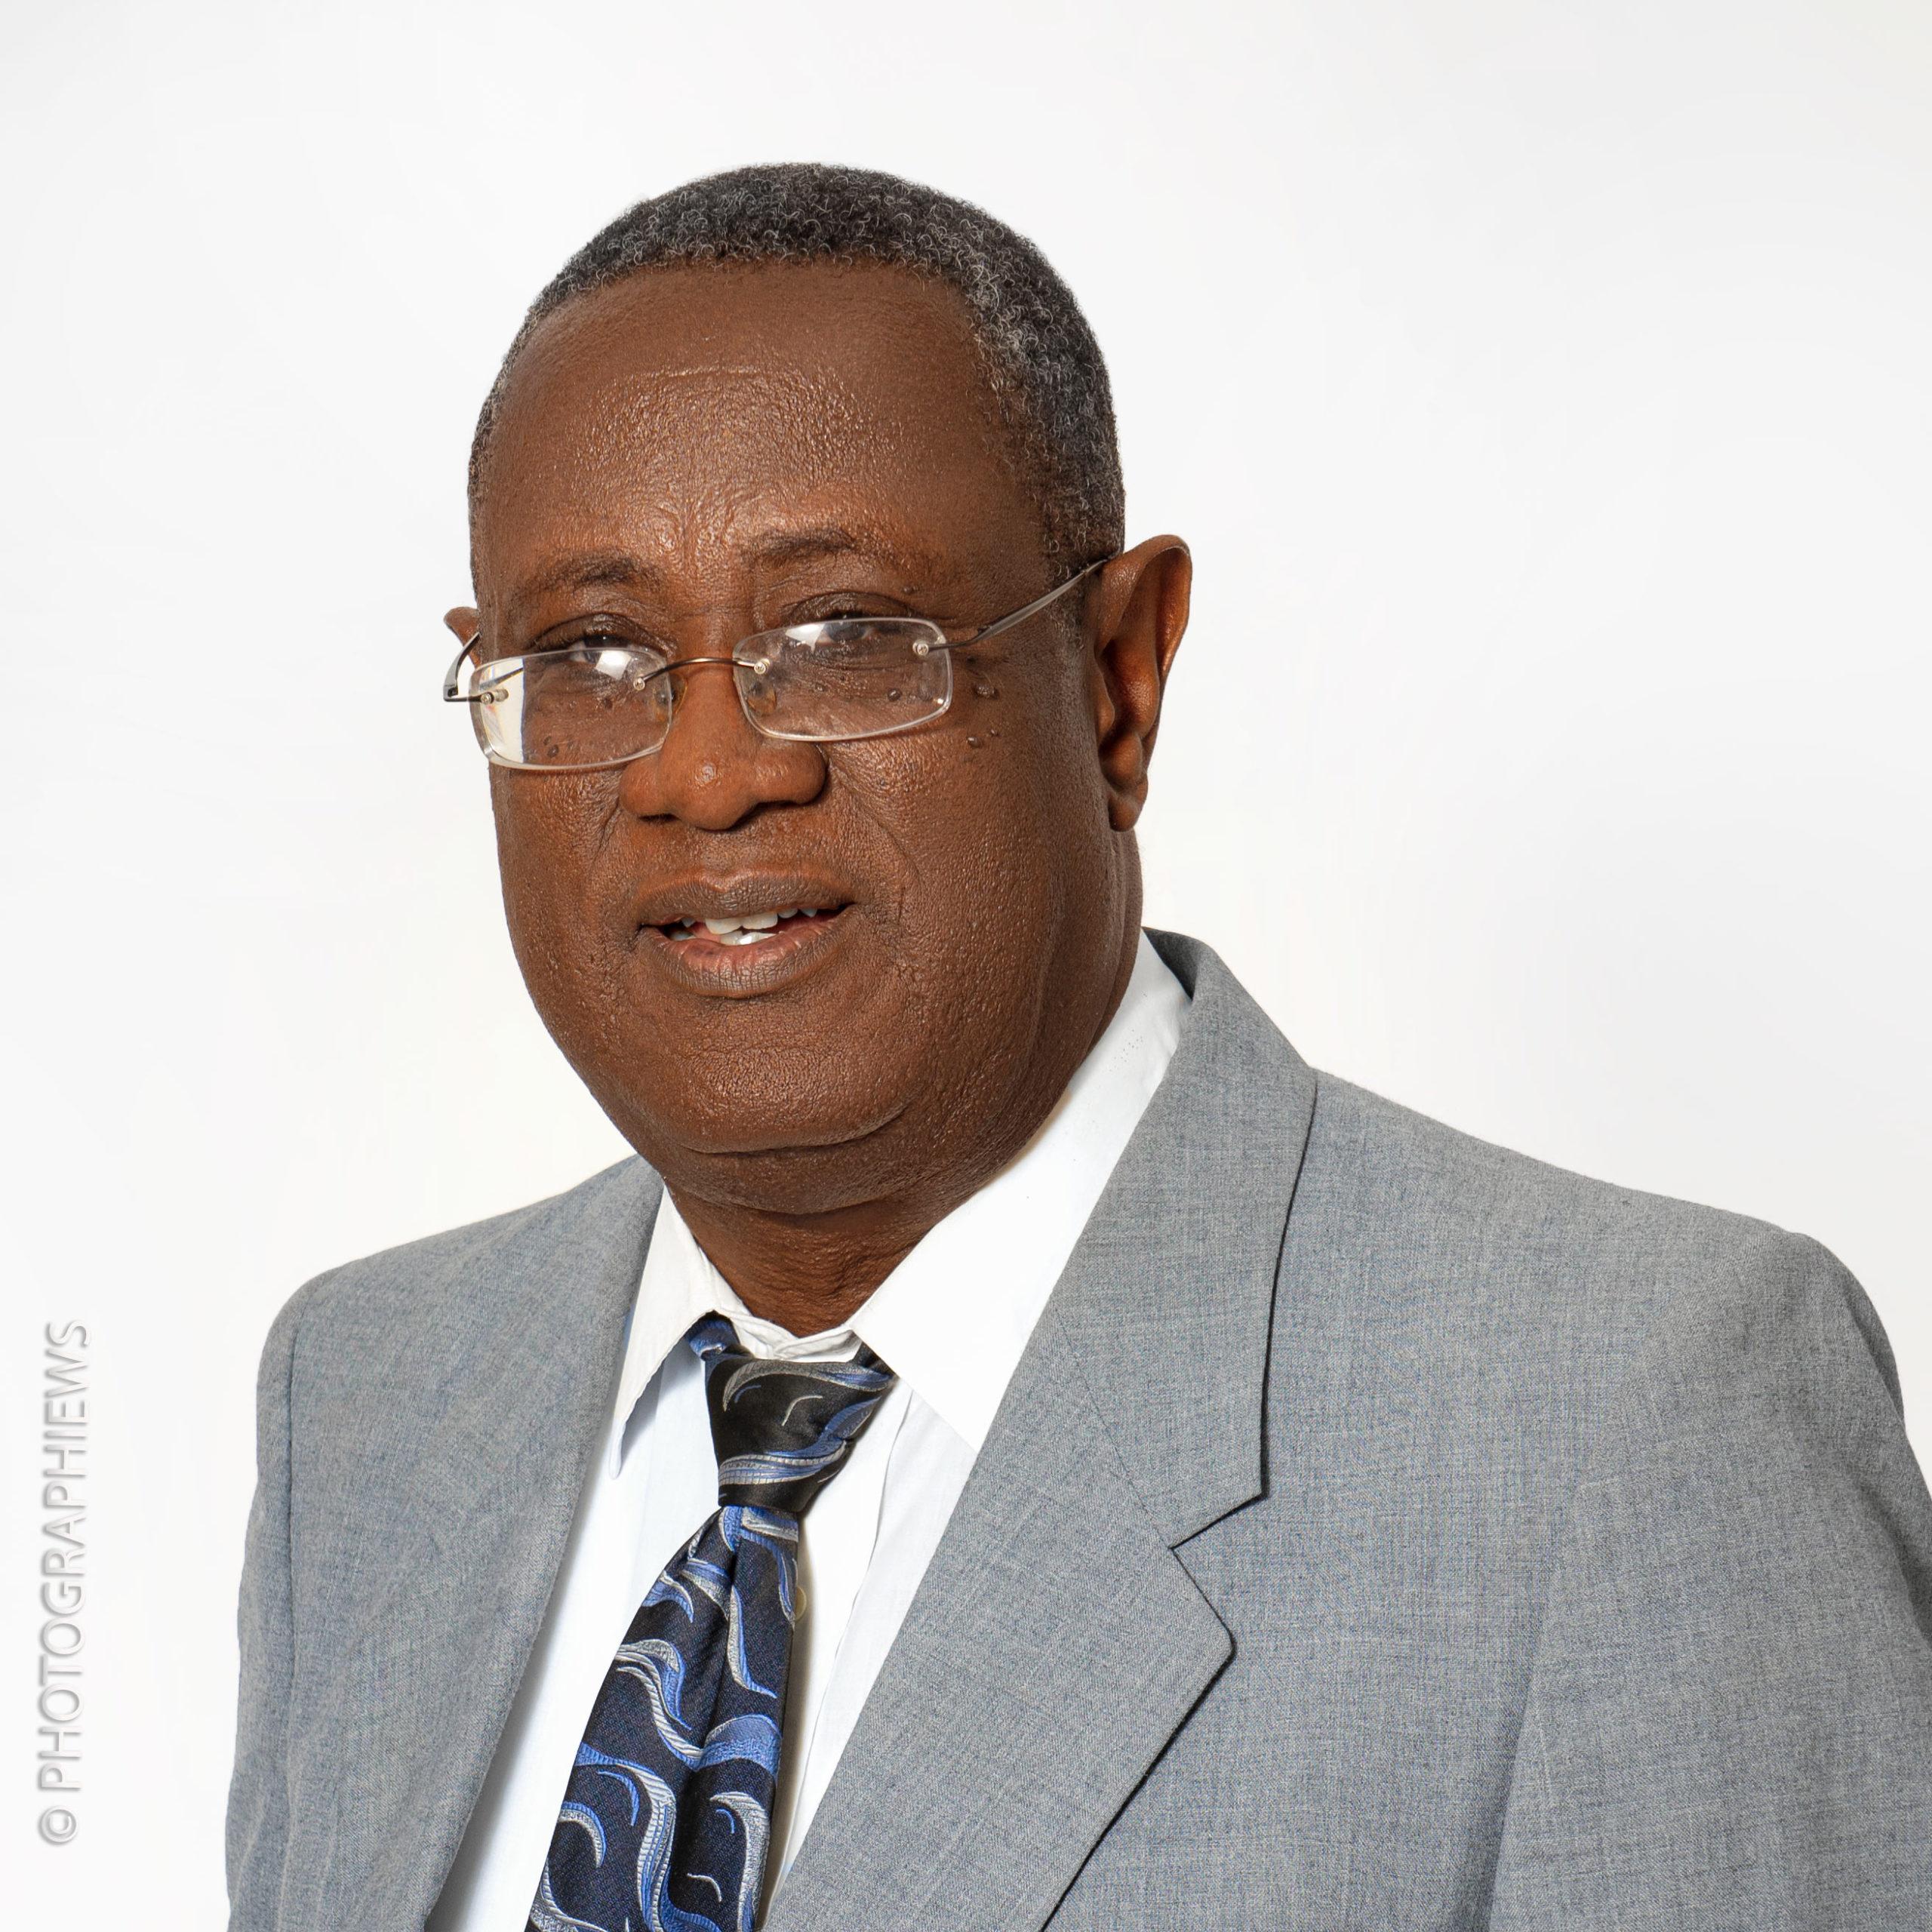 Yvon <b>Charles</b> <br> Mediateur Social & Culture